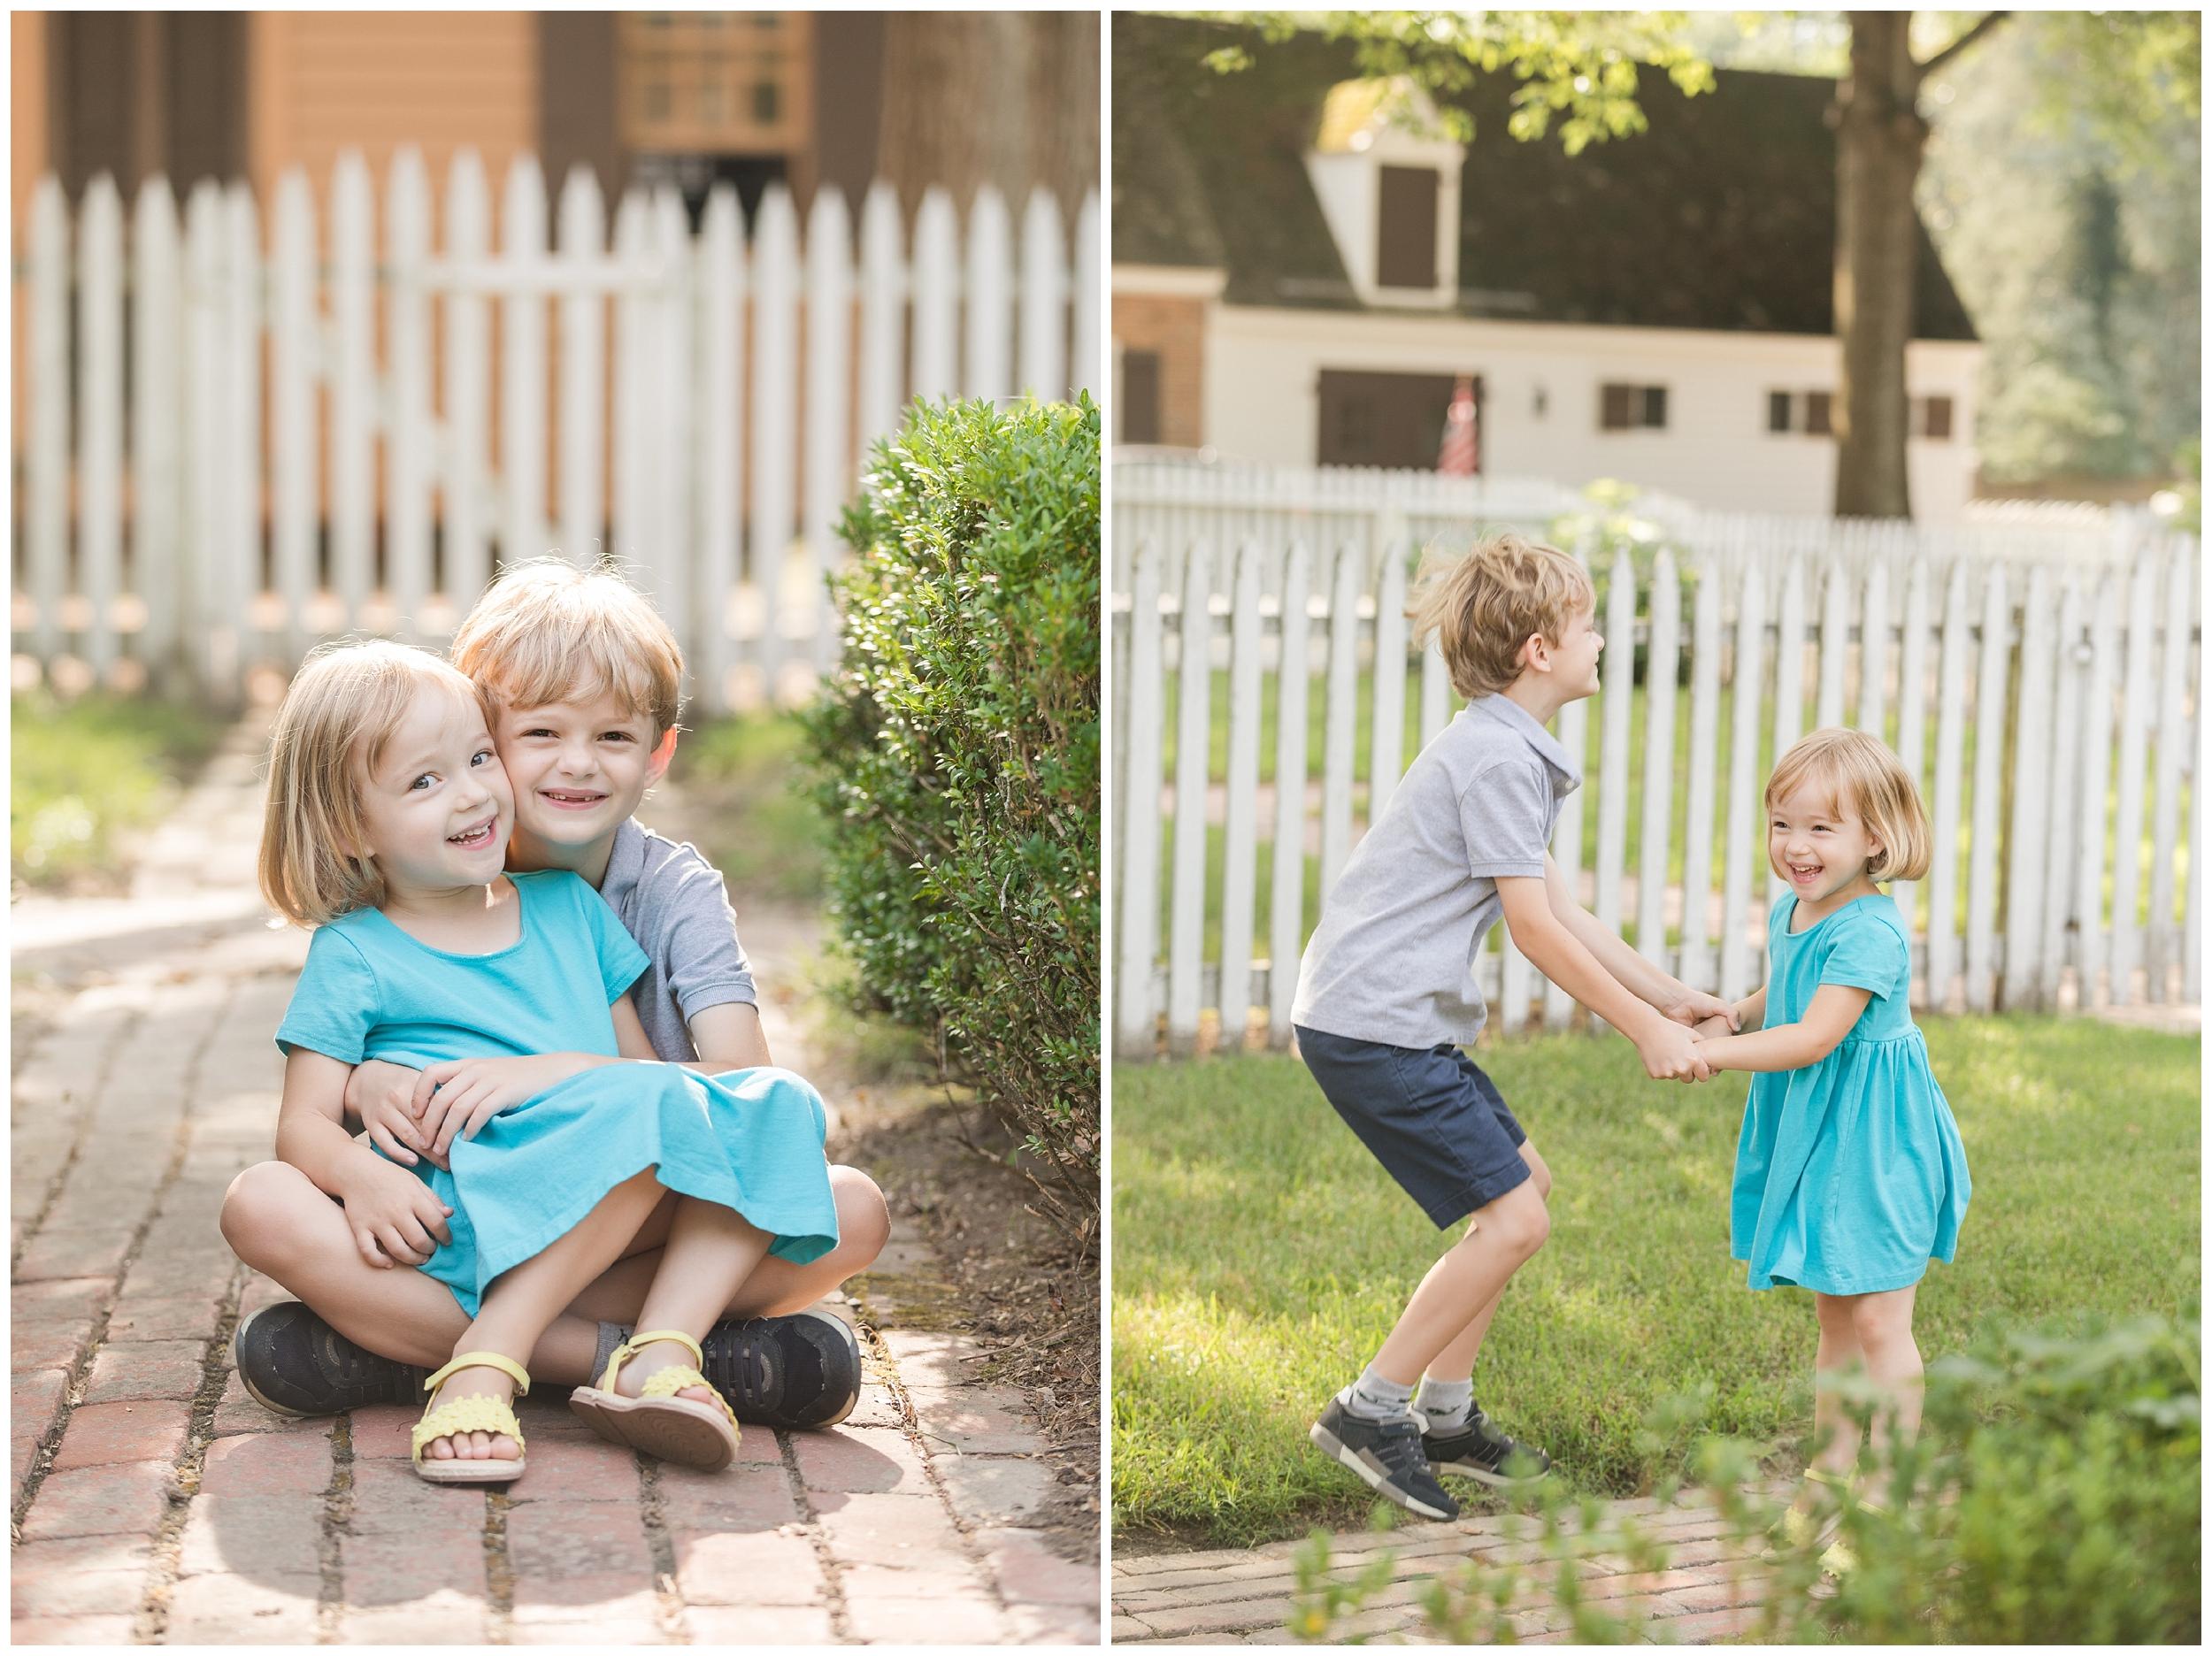 williamsburg family photography by elovephotos_0001.jpg